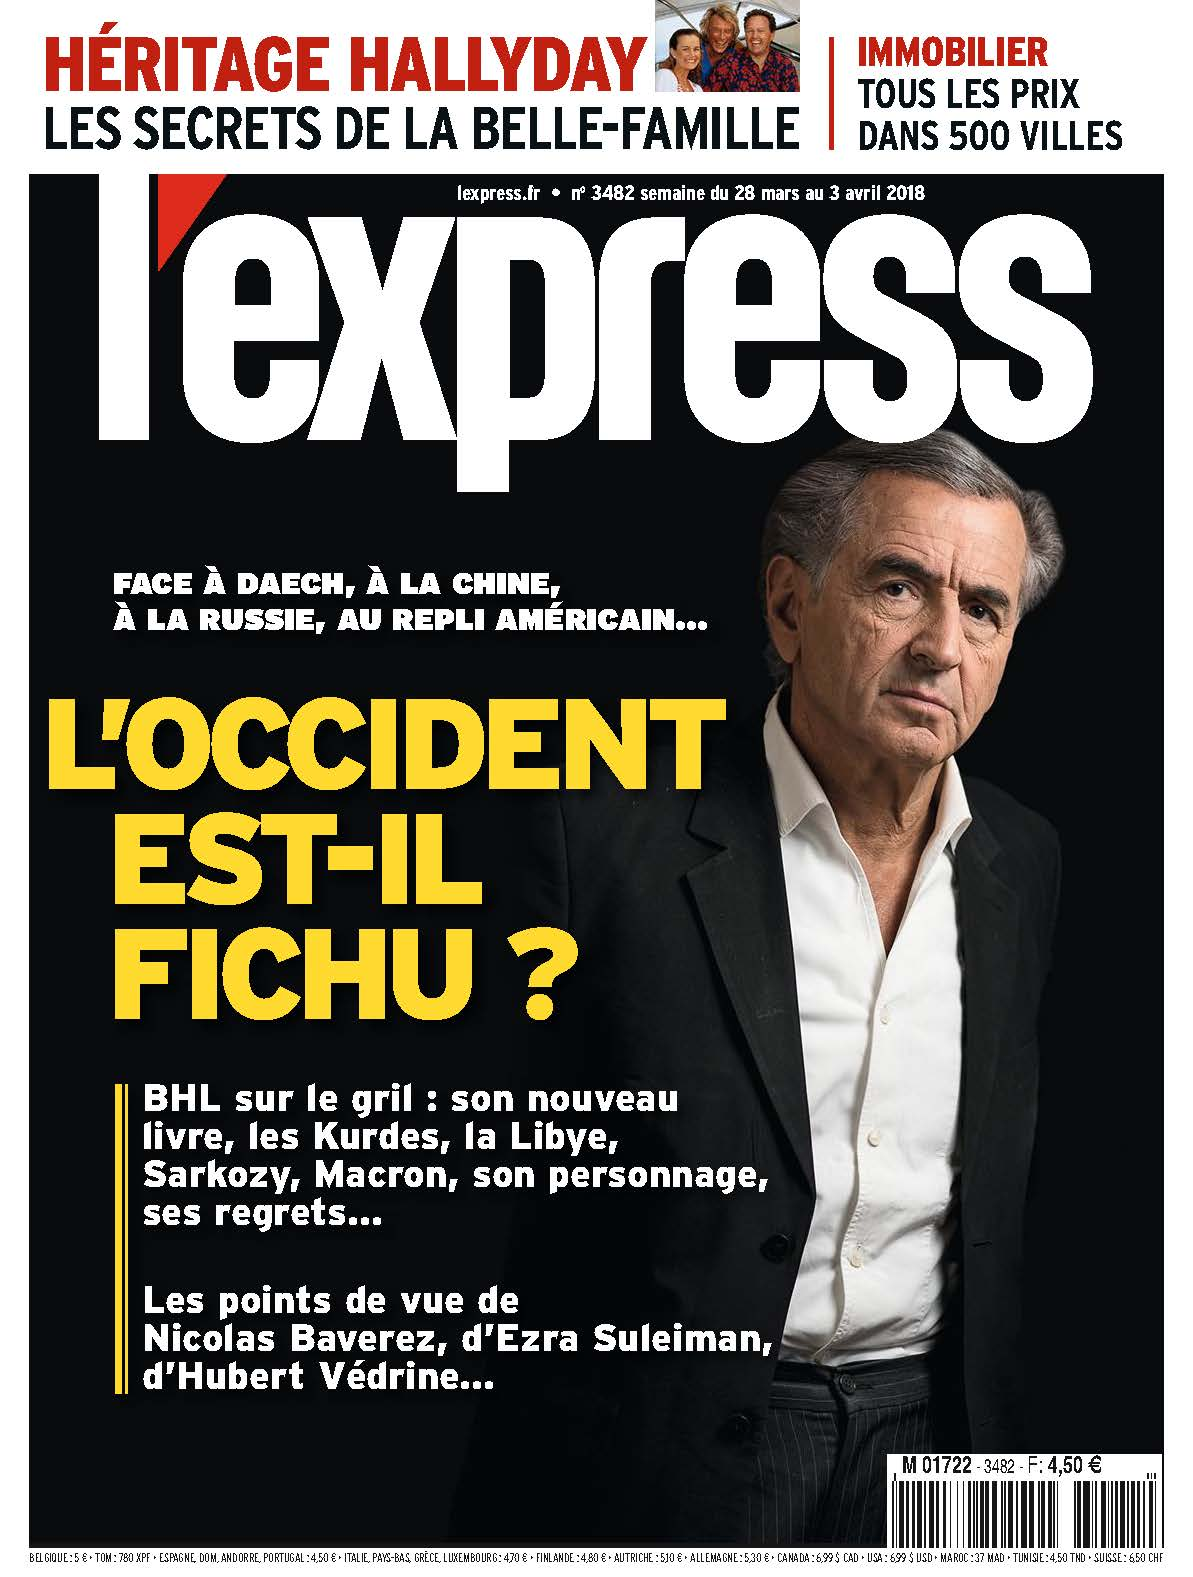 La Une de L'express